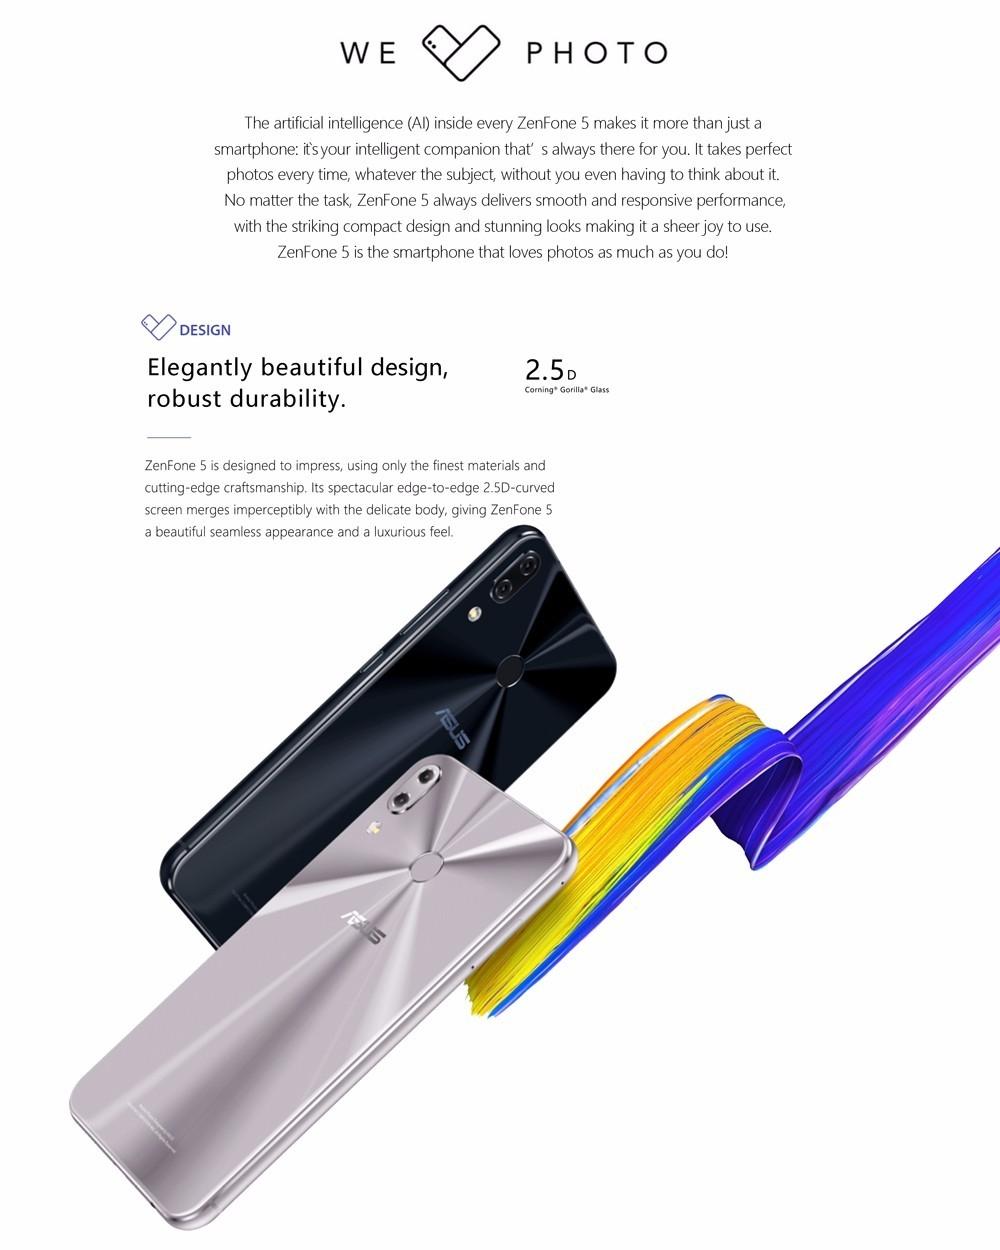 Asus ZENFONE 5 ZE620KL 4G Phablet Android O 6.2 inch Qualcomm Snapdragon 636 Octa Core 1.8GHz 4GB RAM 64GB ROM Fingerprint Scanner Type-C Bluetooth 5.0